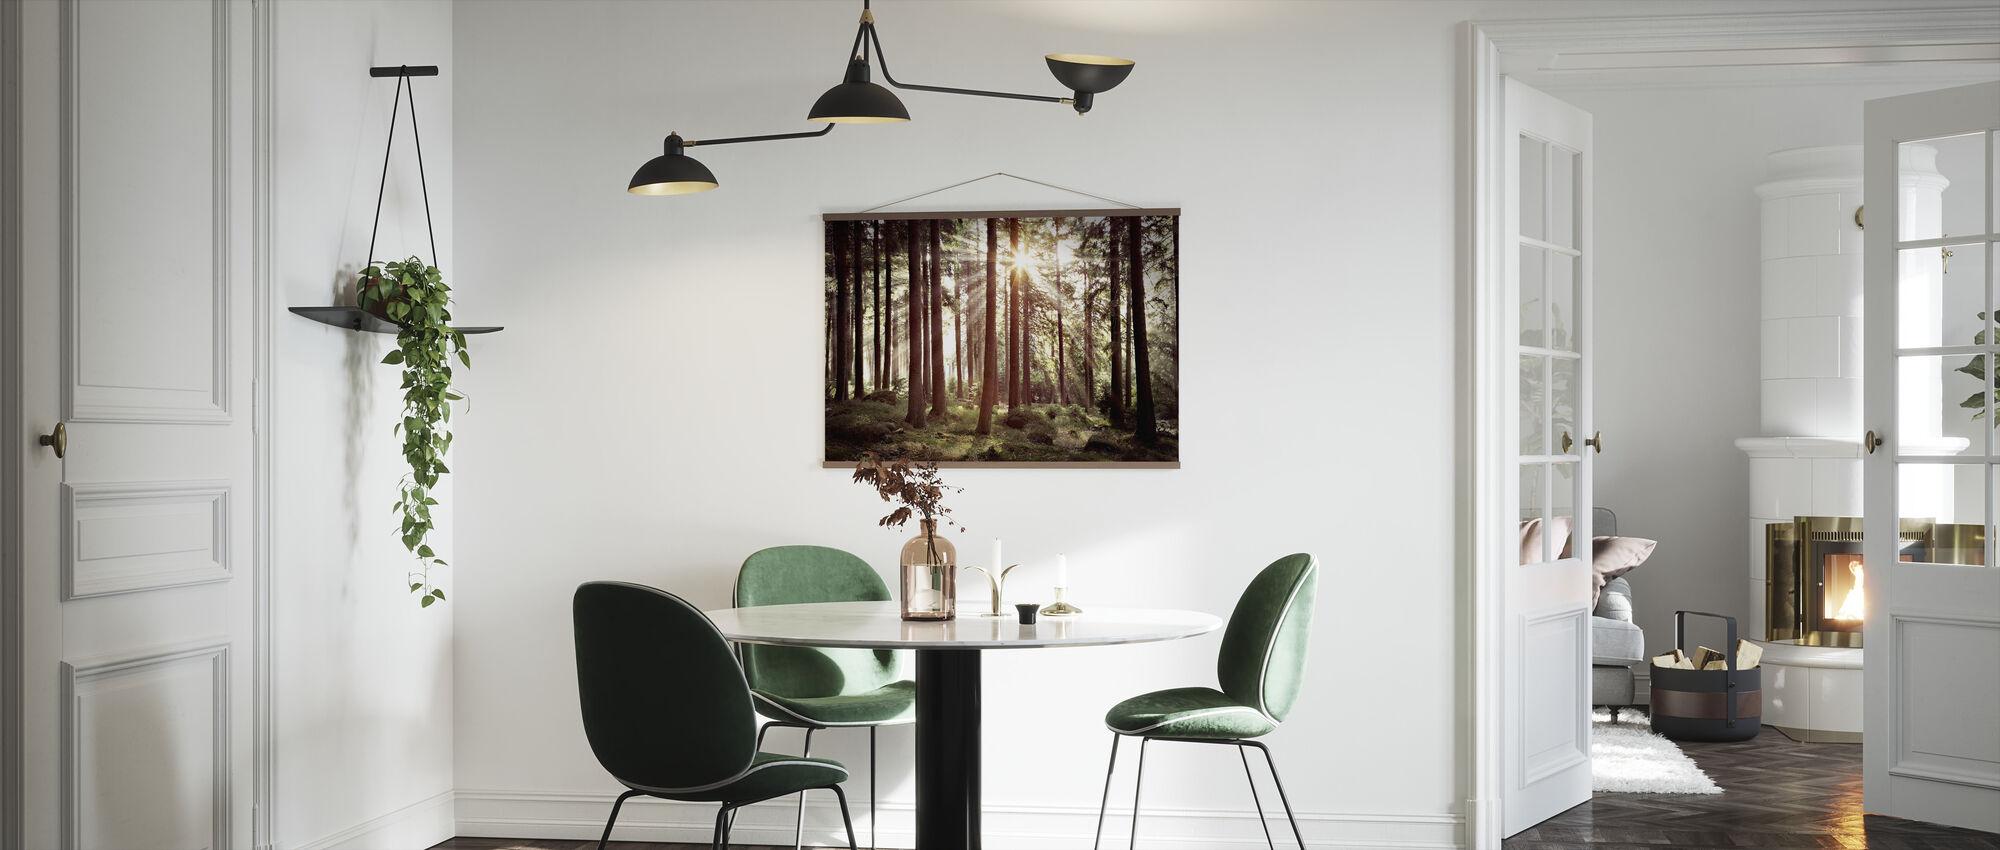 Sunbeam Through Trees - Retro - Poster - Kitchen